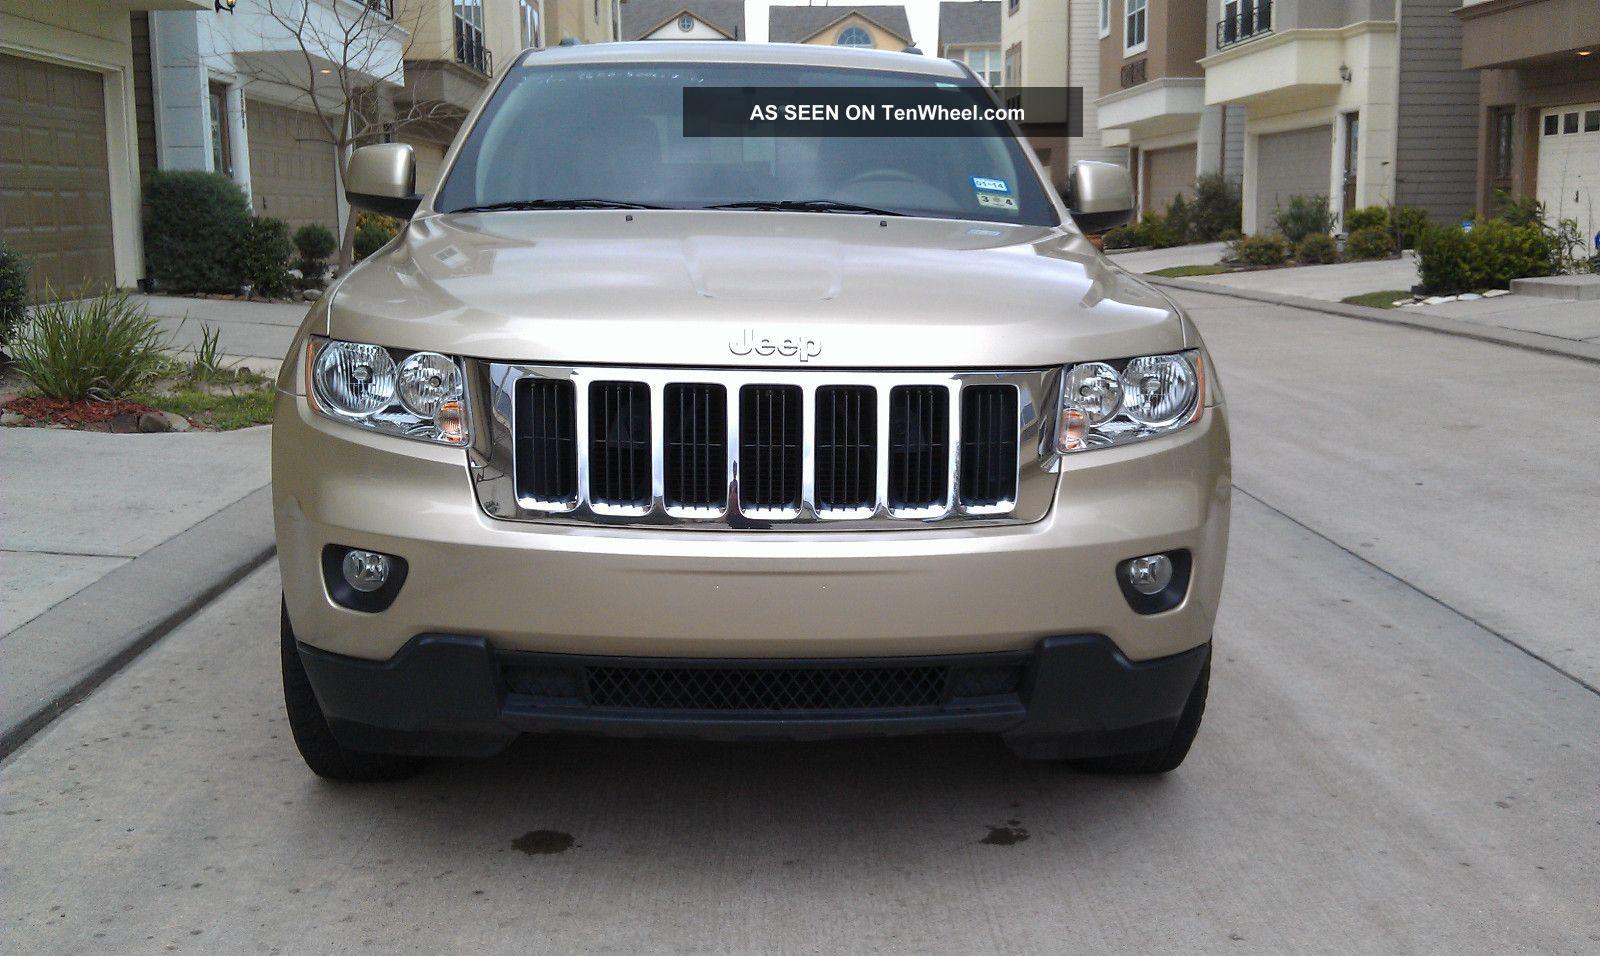 2011 Jeep Grand Cherokee Laredo Sport Utility 4 - Door 3.  6l Grand Cherokee photo